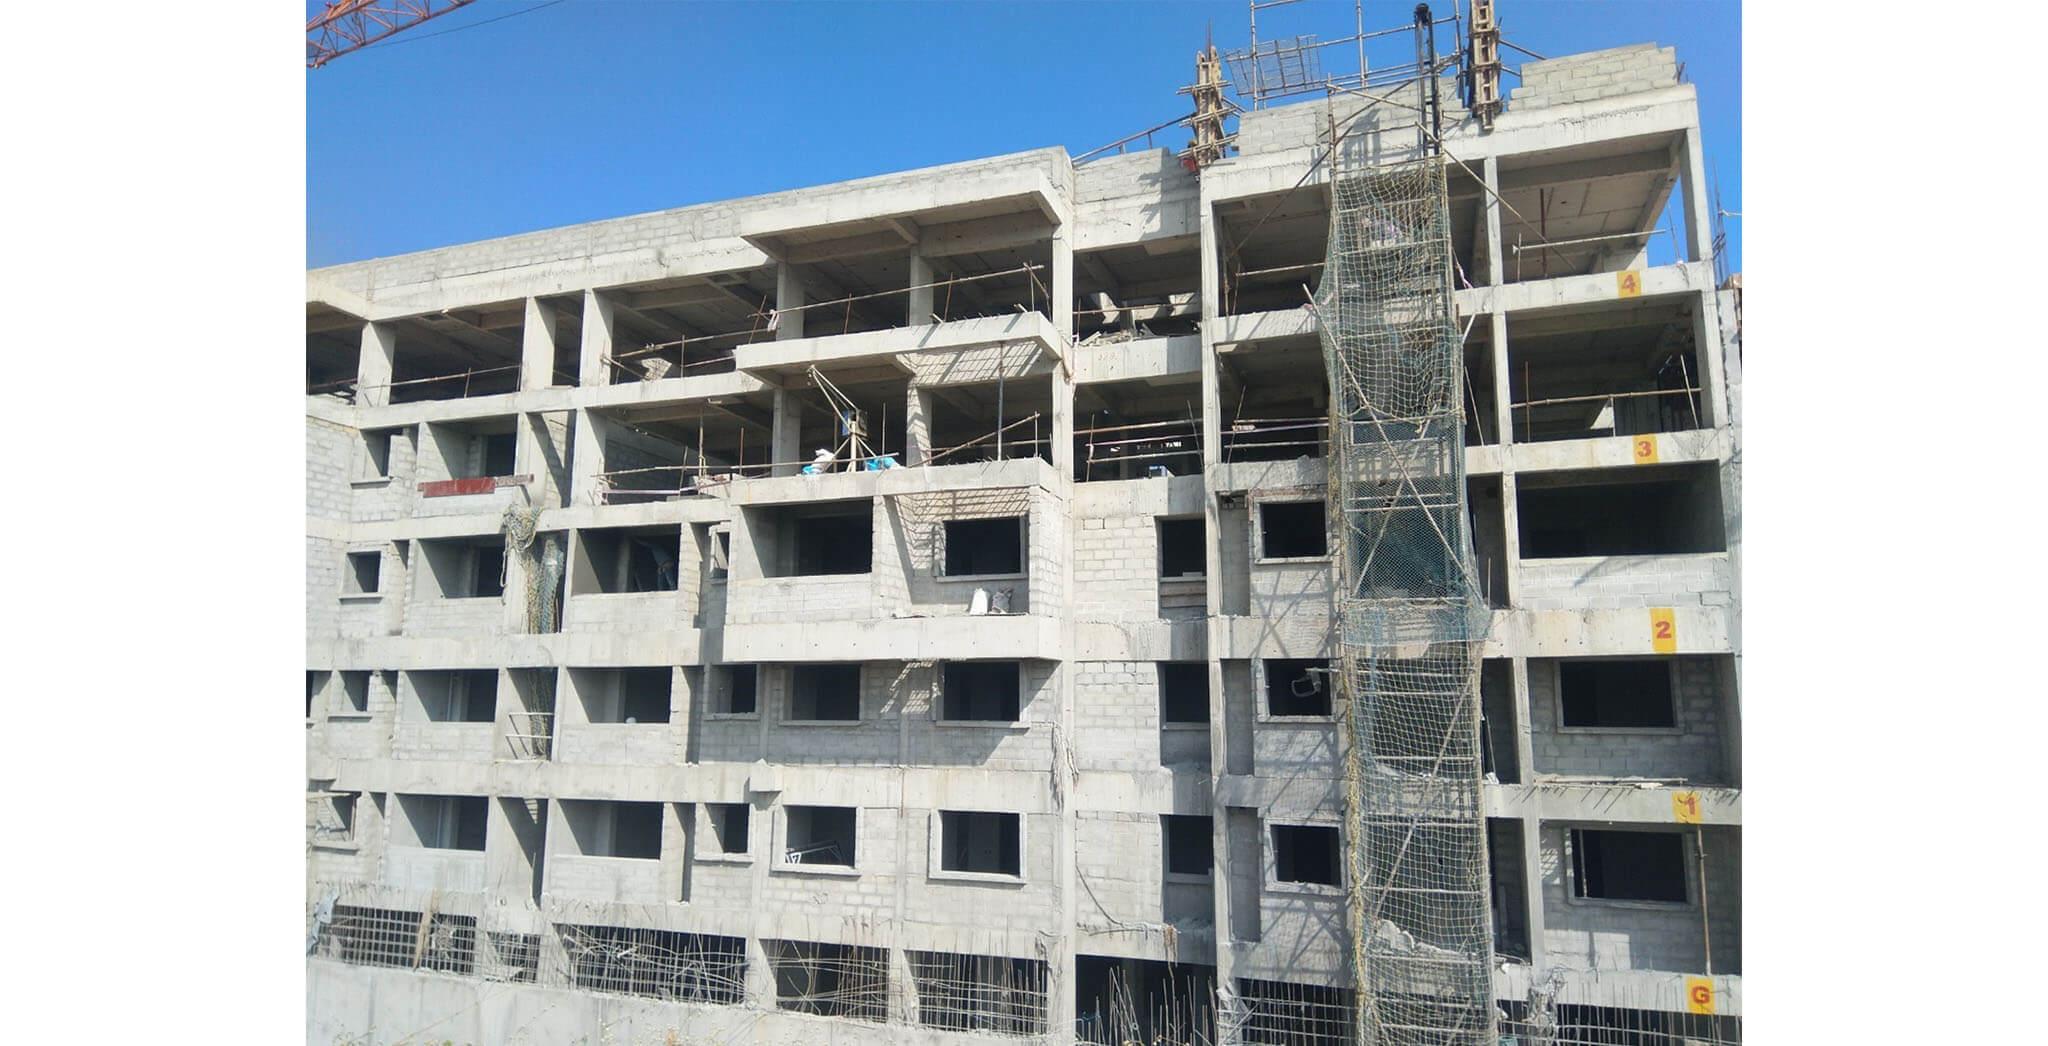 Jan 2020 - Tower-F: Terrace slab Completed, above terrace work-in-progress.